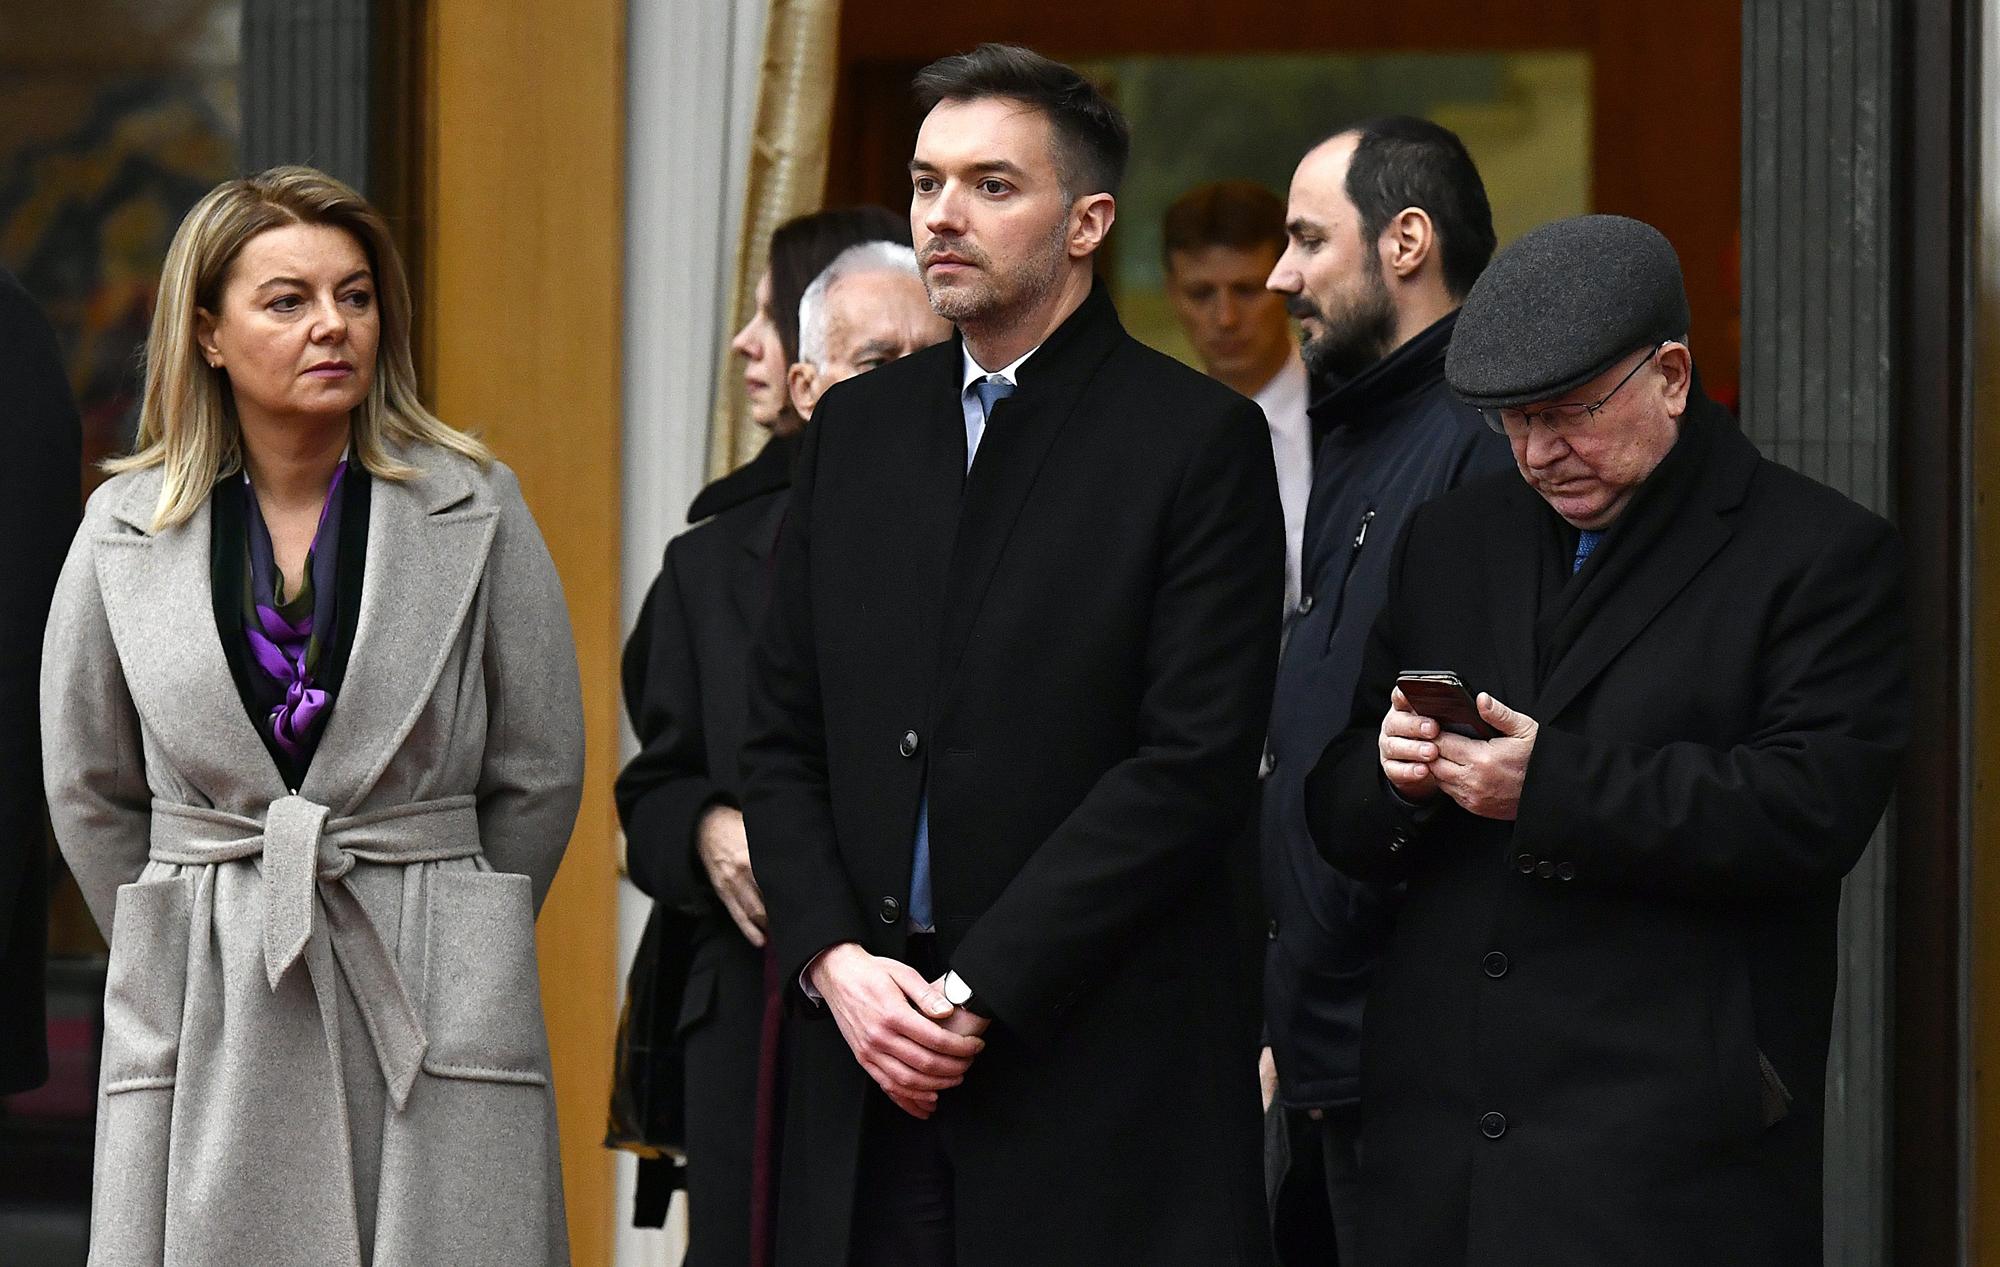 Mirjana Hrga, Sebastian Rogač, Mate Granić